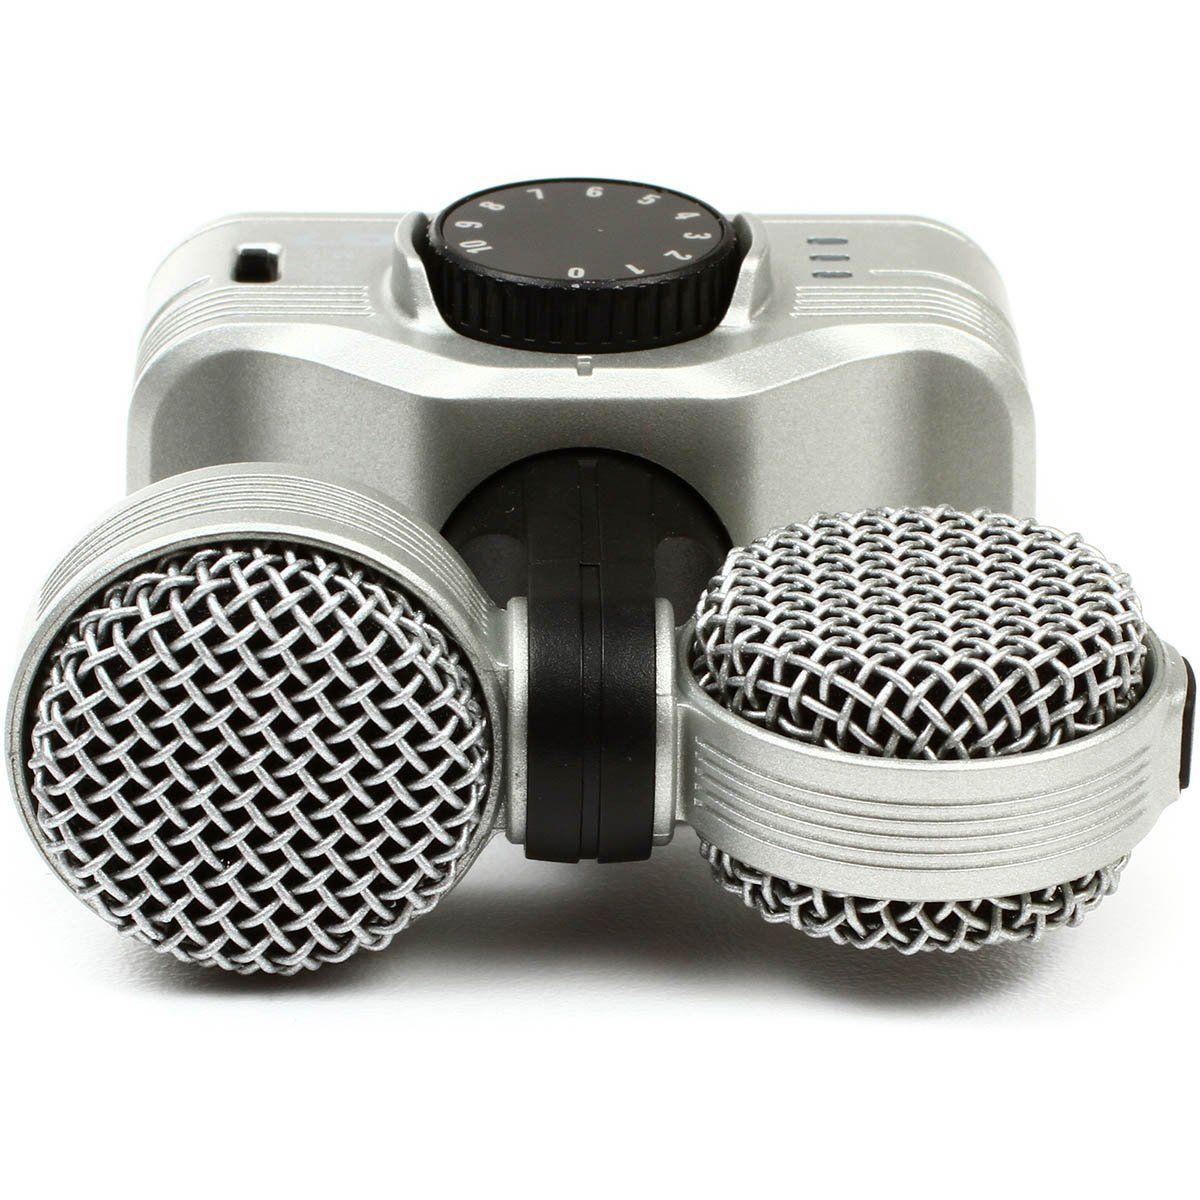 Zoom iQ7 Gravador de Áudio Zoom iQ-7 Microfone Condensador Estéreo iPad iPod iPhone